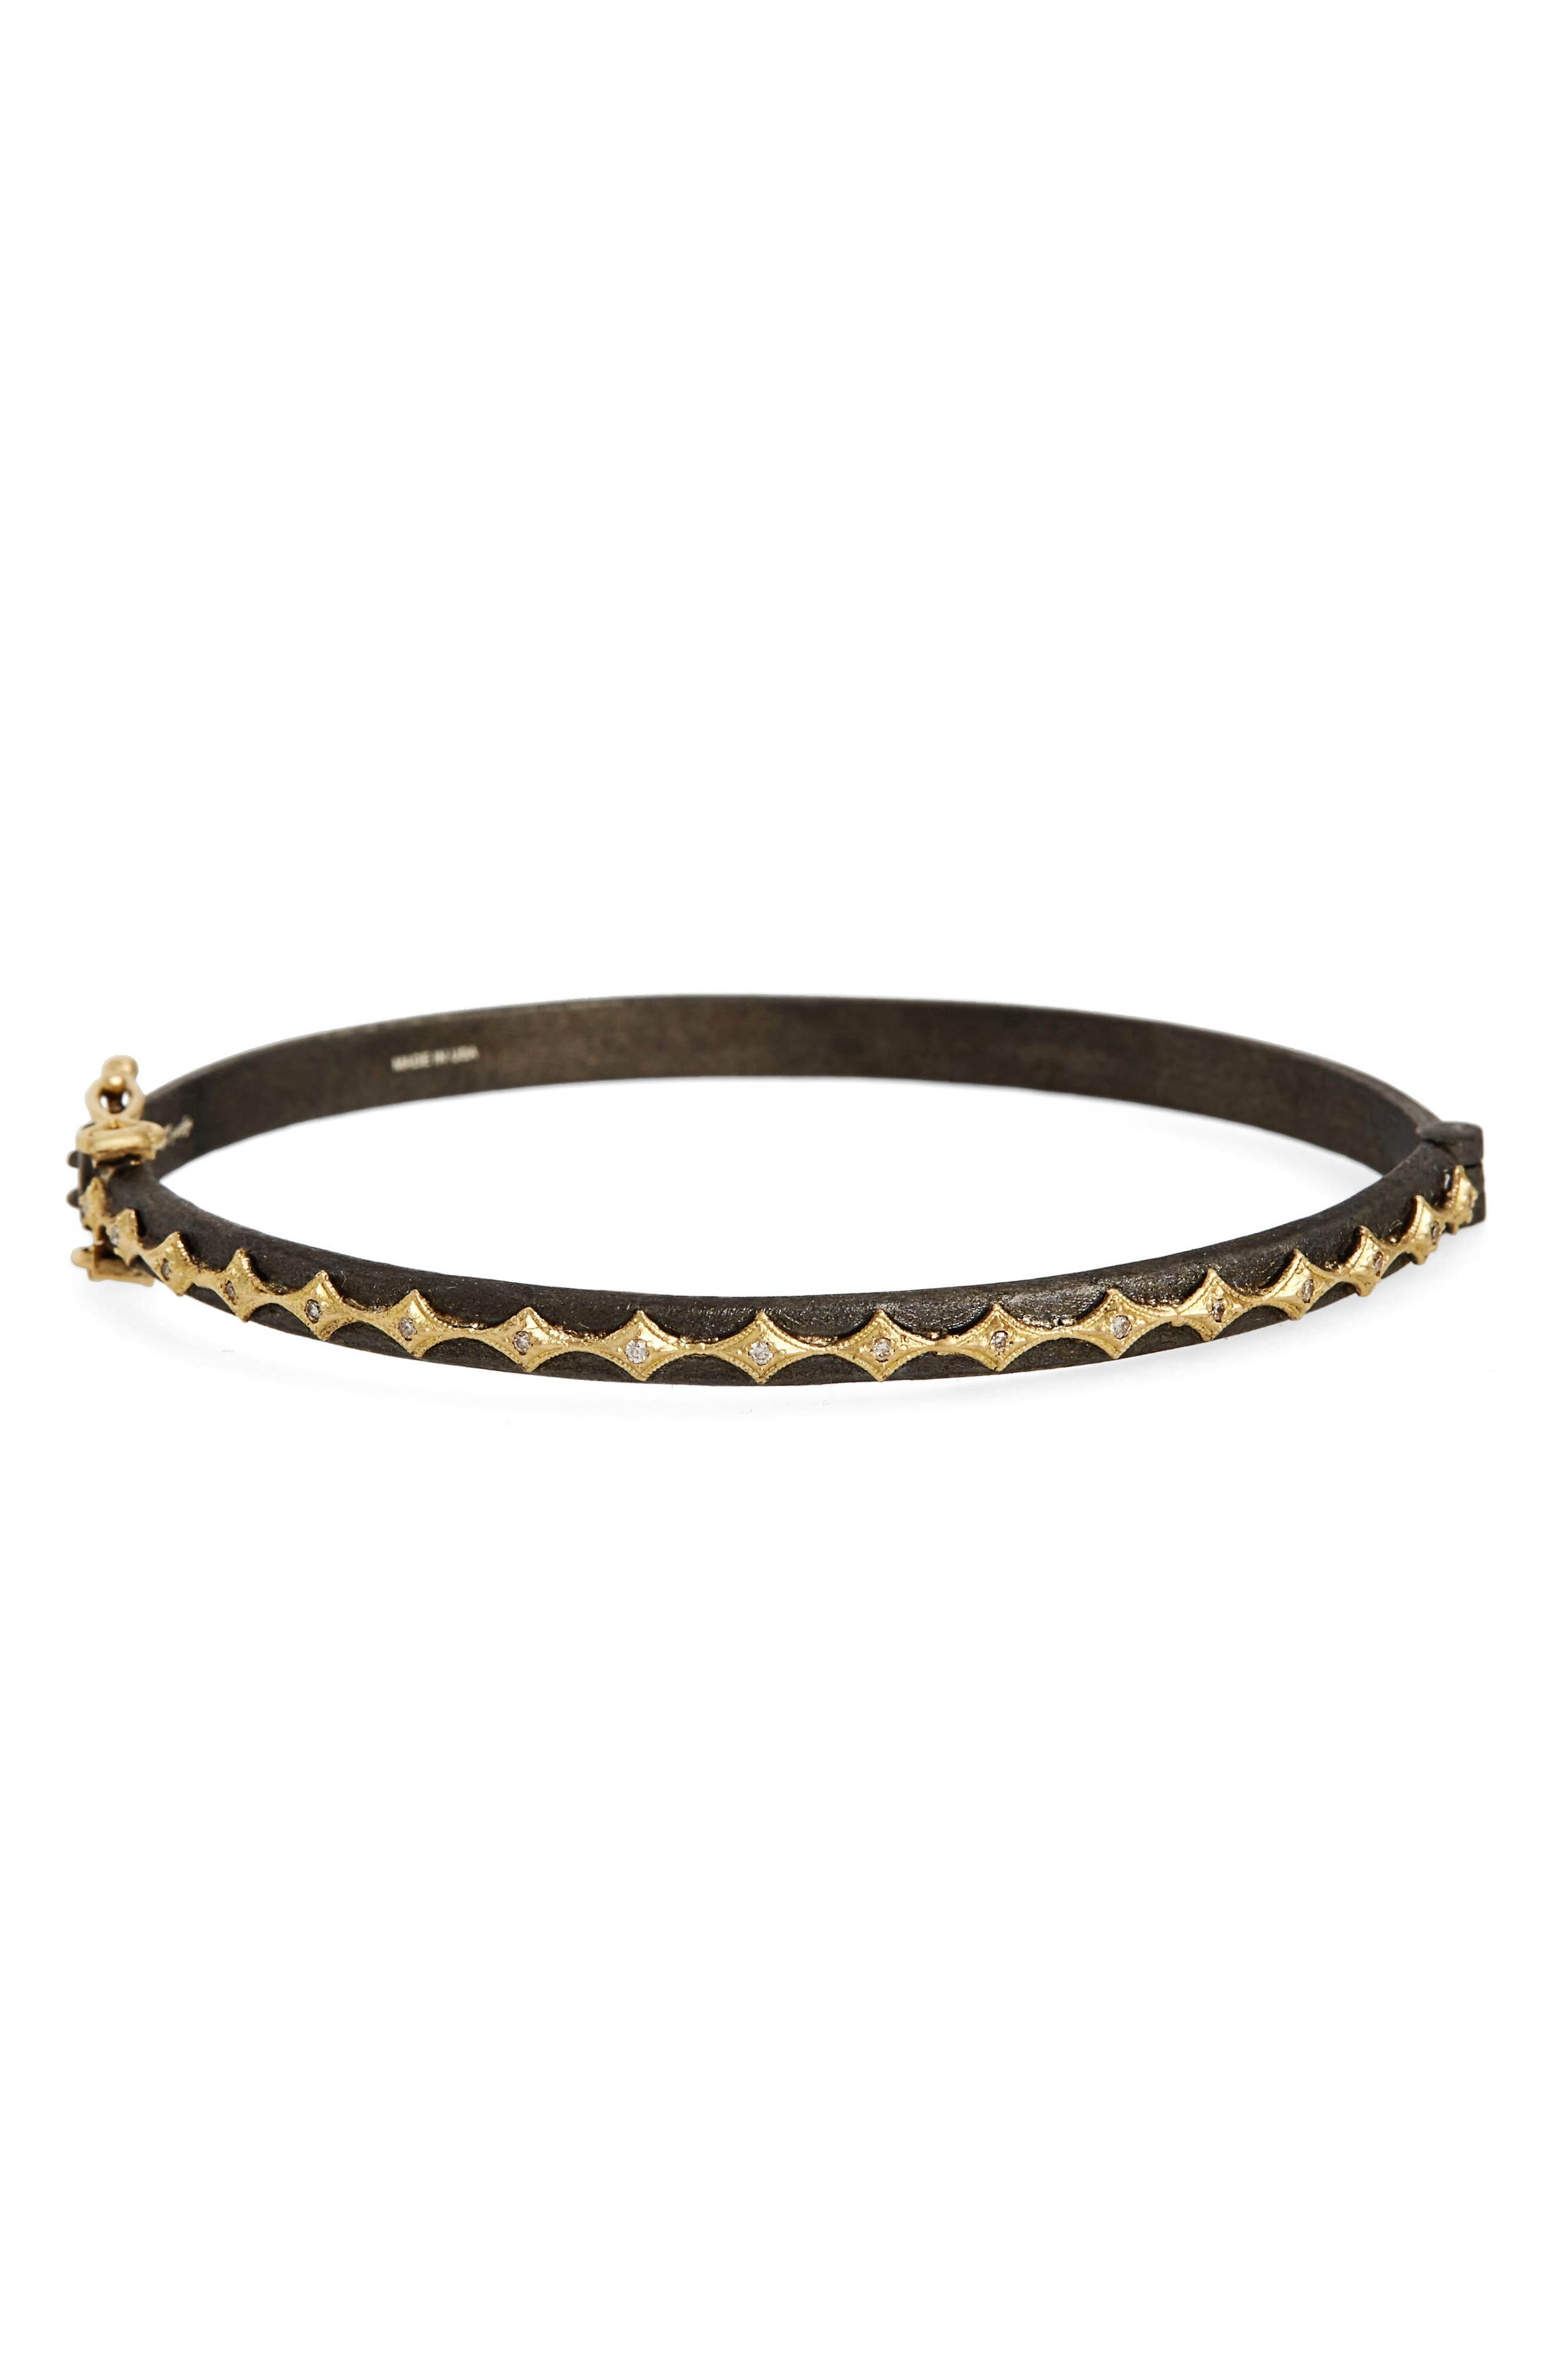 Main Image - Armenta Old World Eternity Crivelli Diamond Bracelet